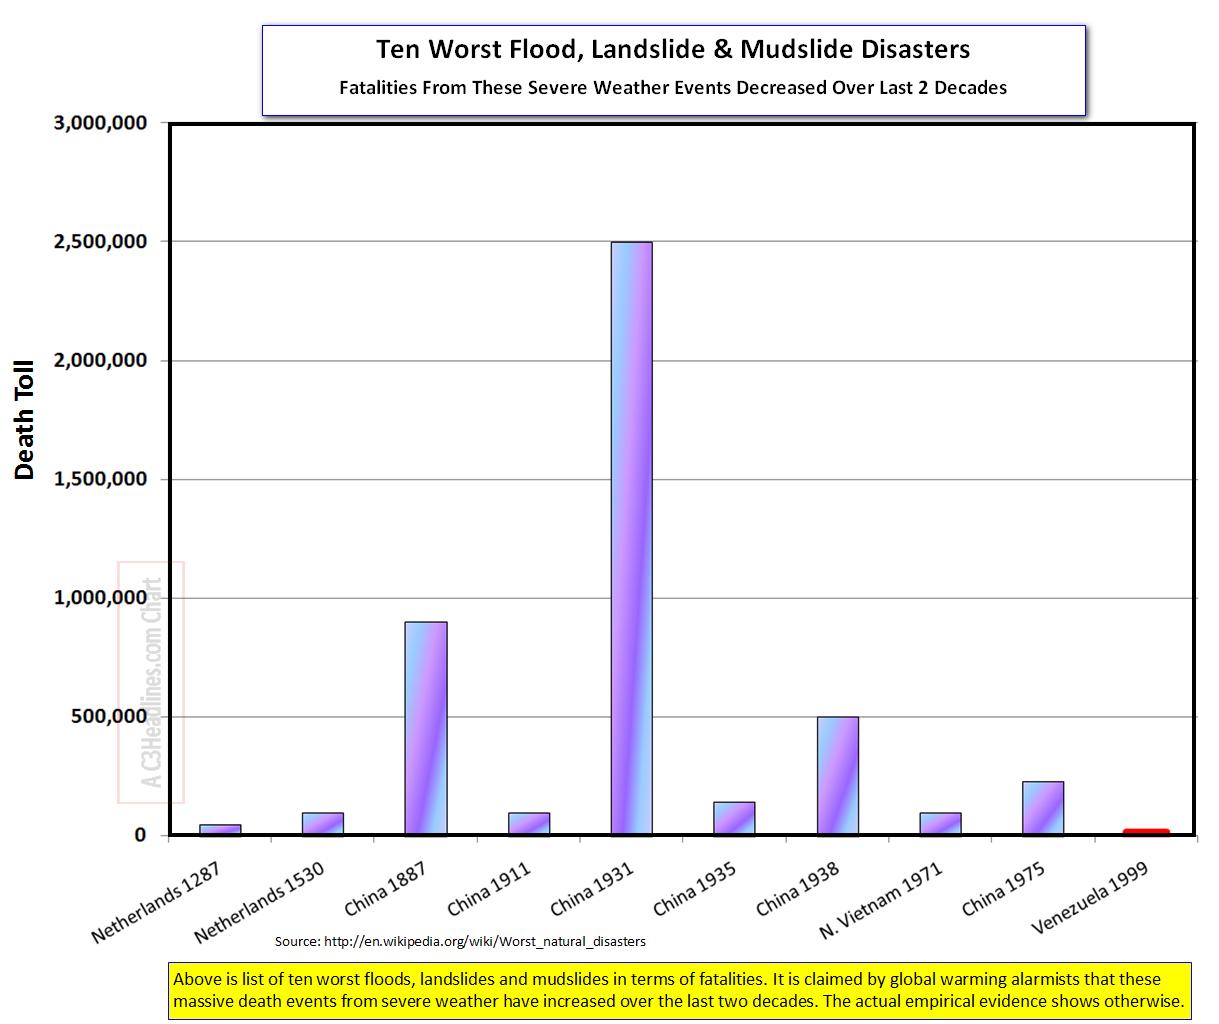 Ten Worst Floods Landslides